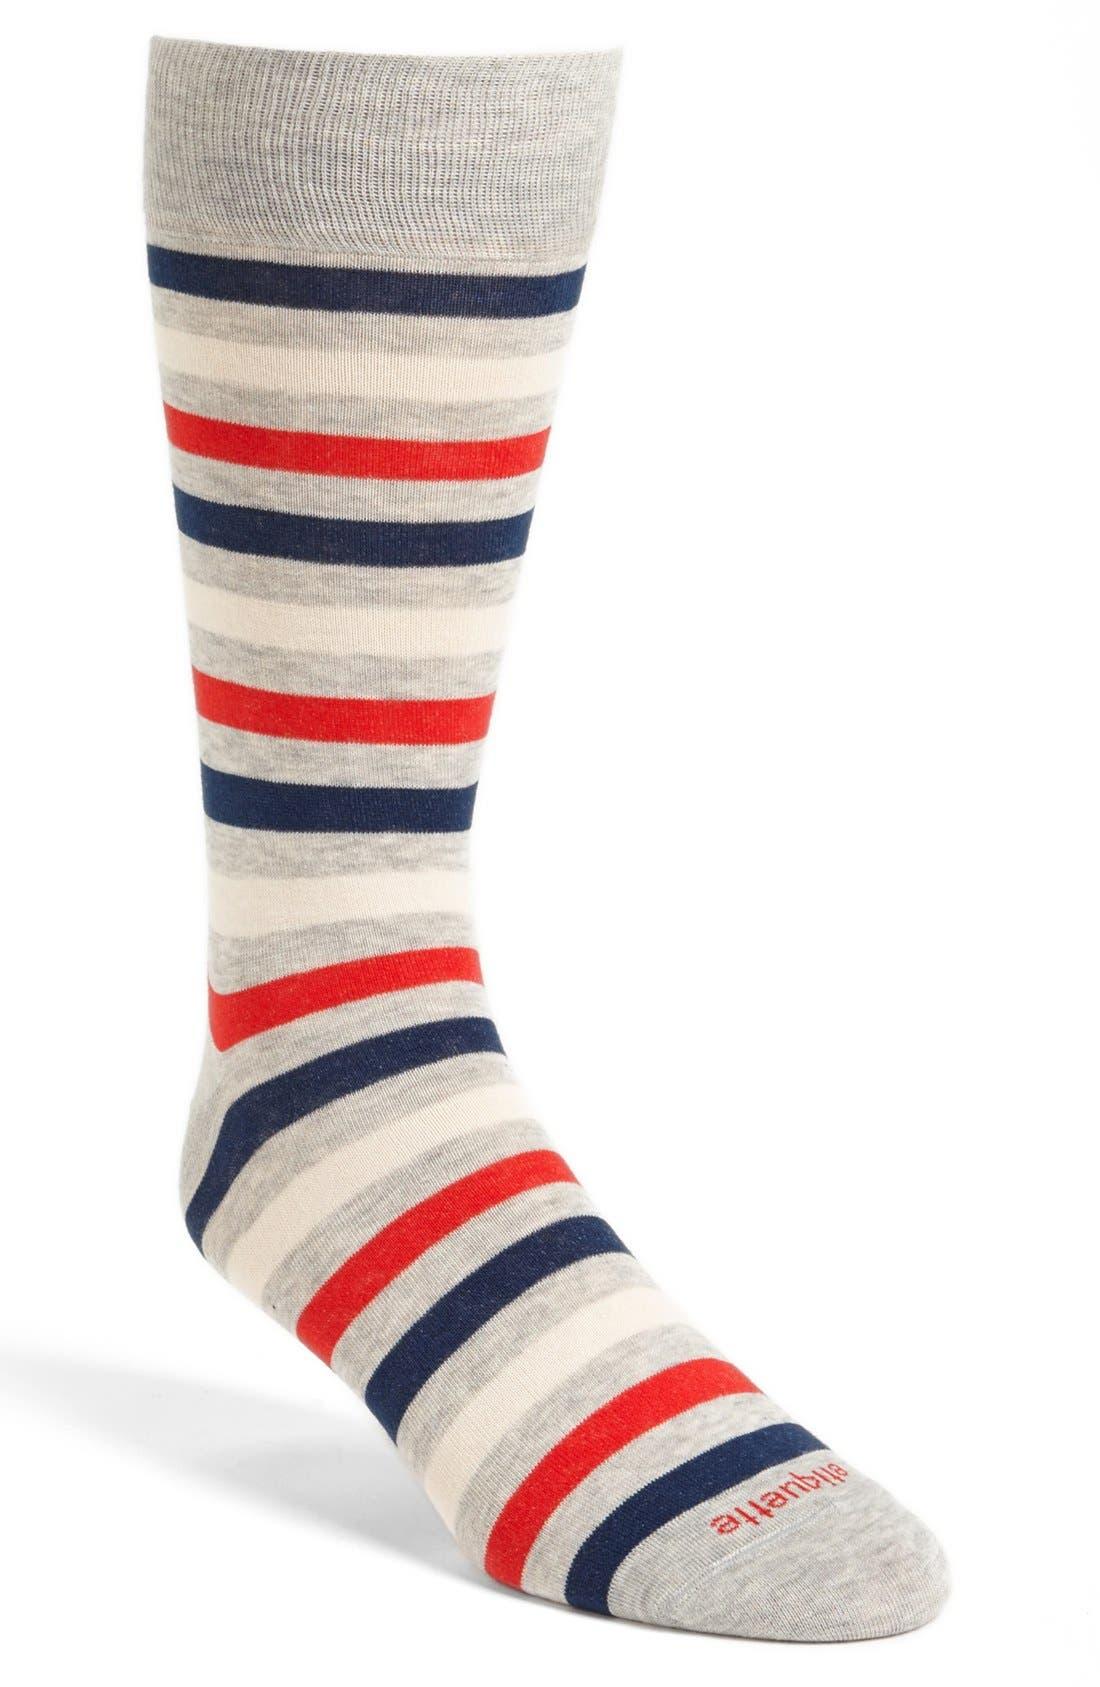 Alternate Image 1 Selected - Etiquette Clothiers 'Crosswalk' Socks